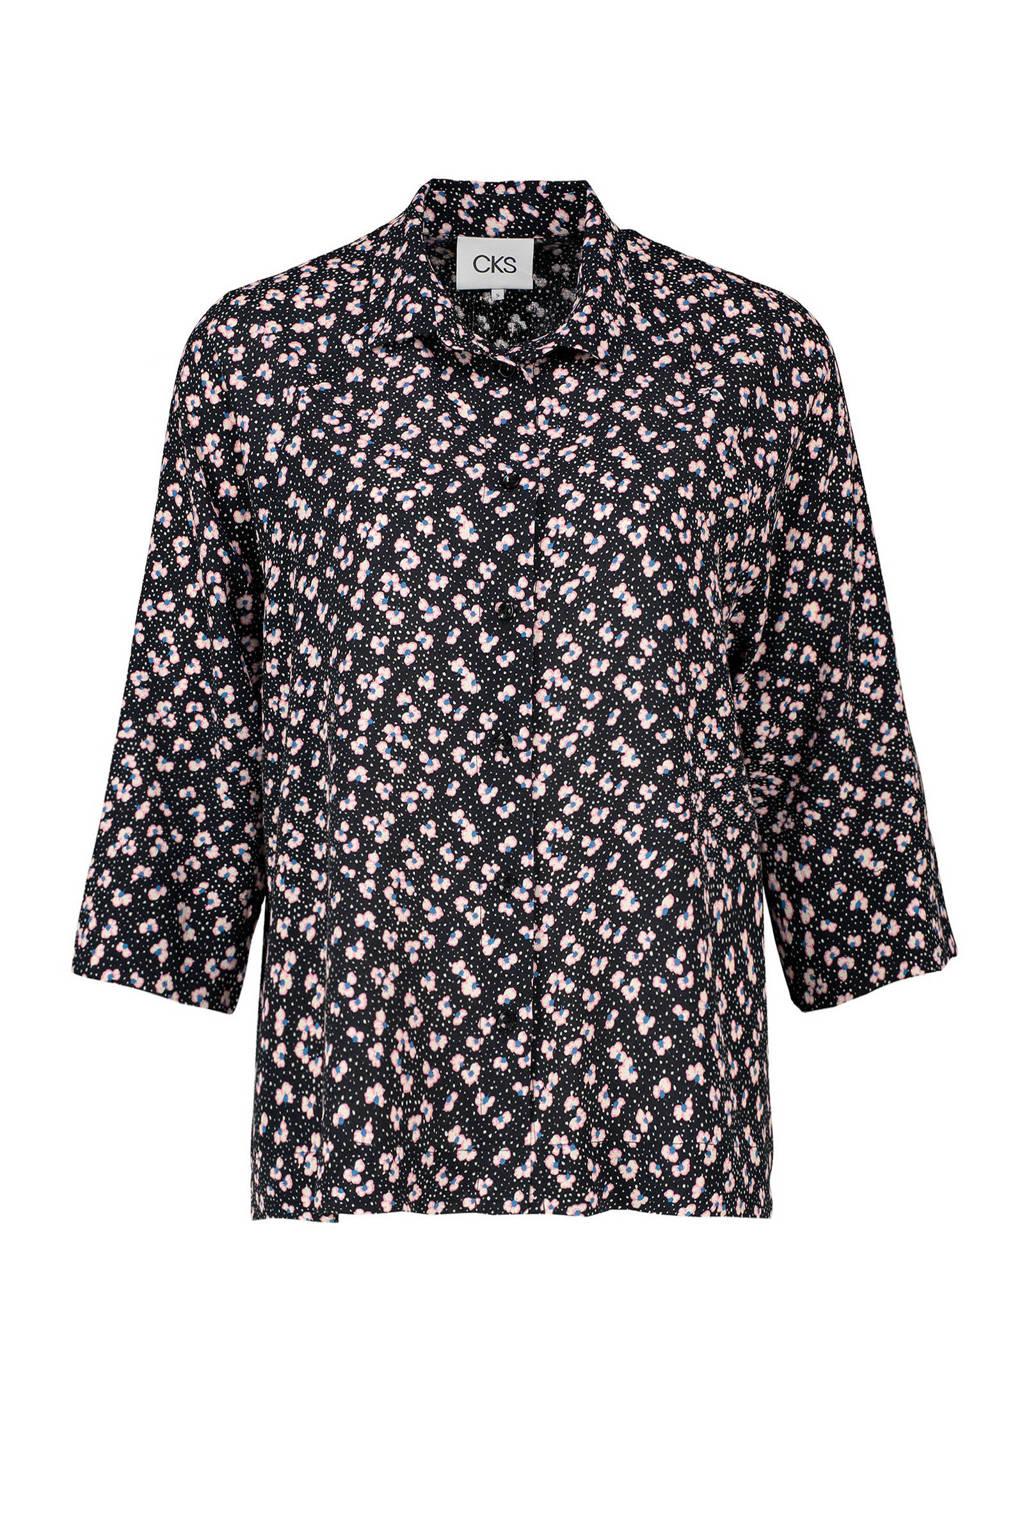 CKS gebloemde blouse zwart, Zwart